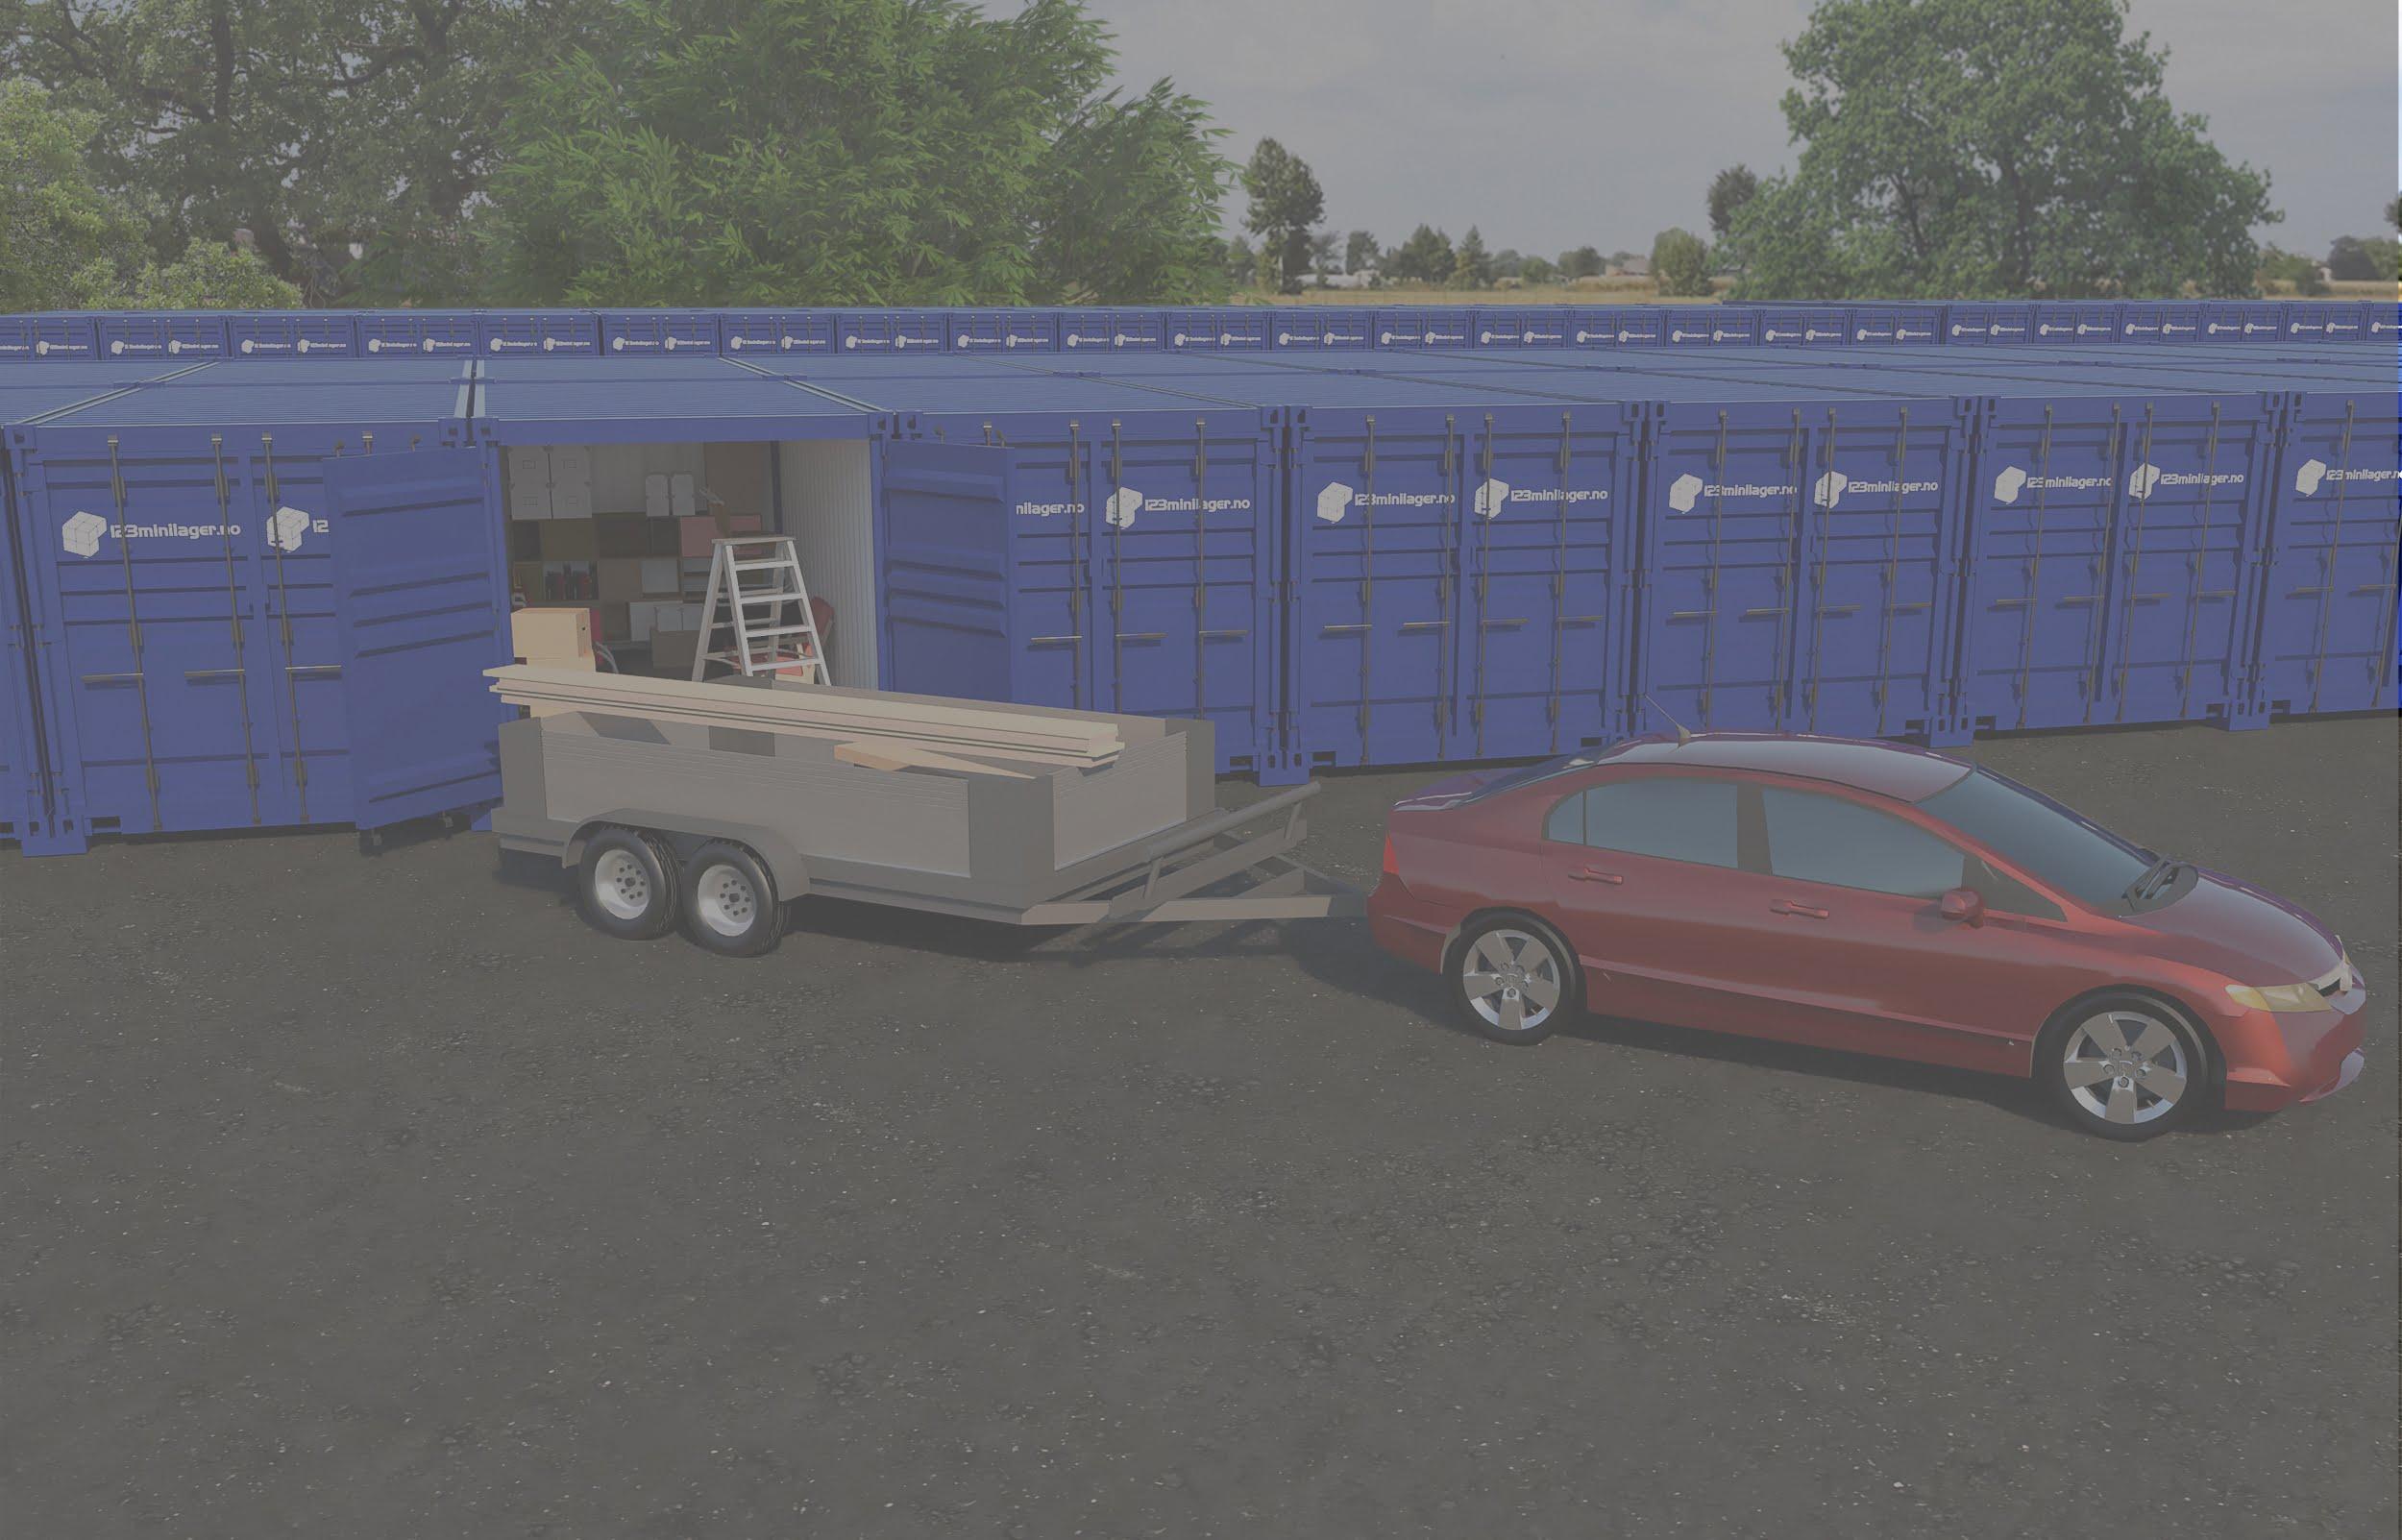 Leie flere containere